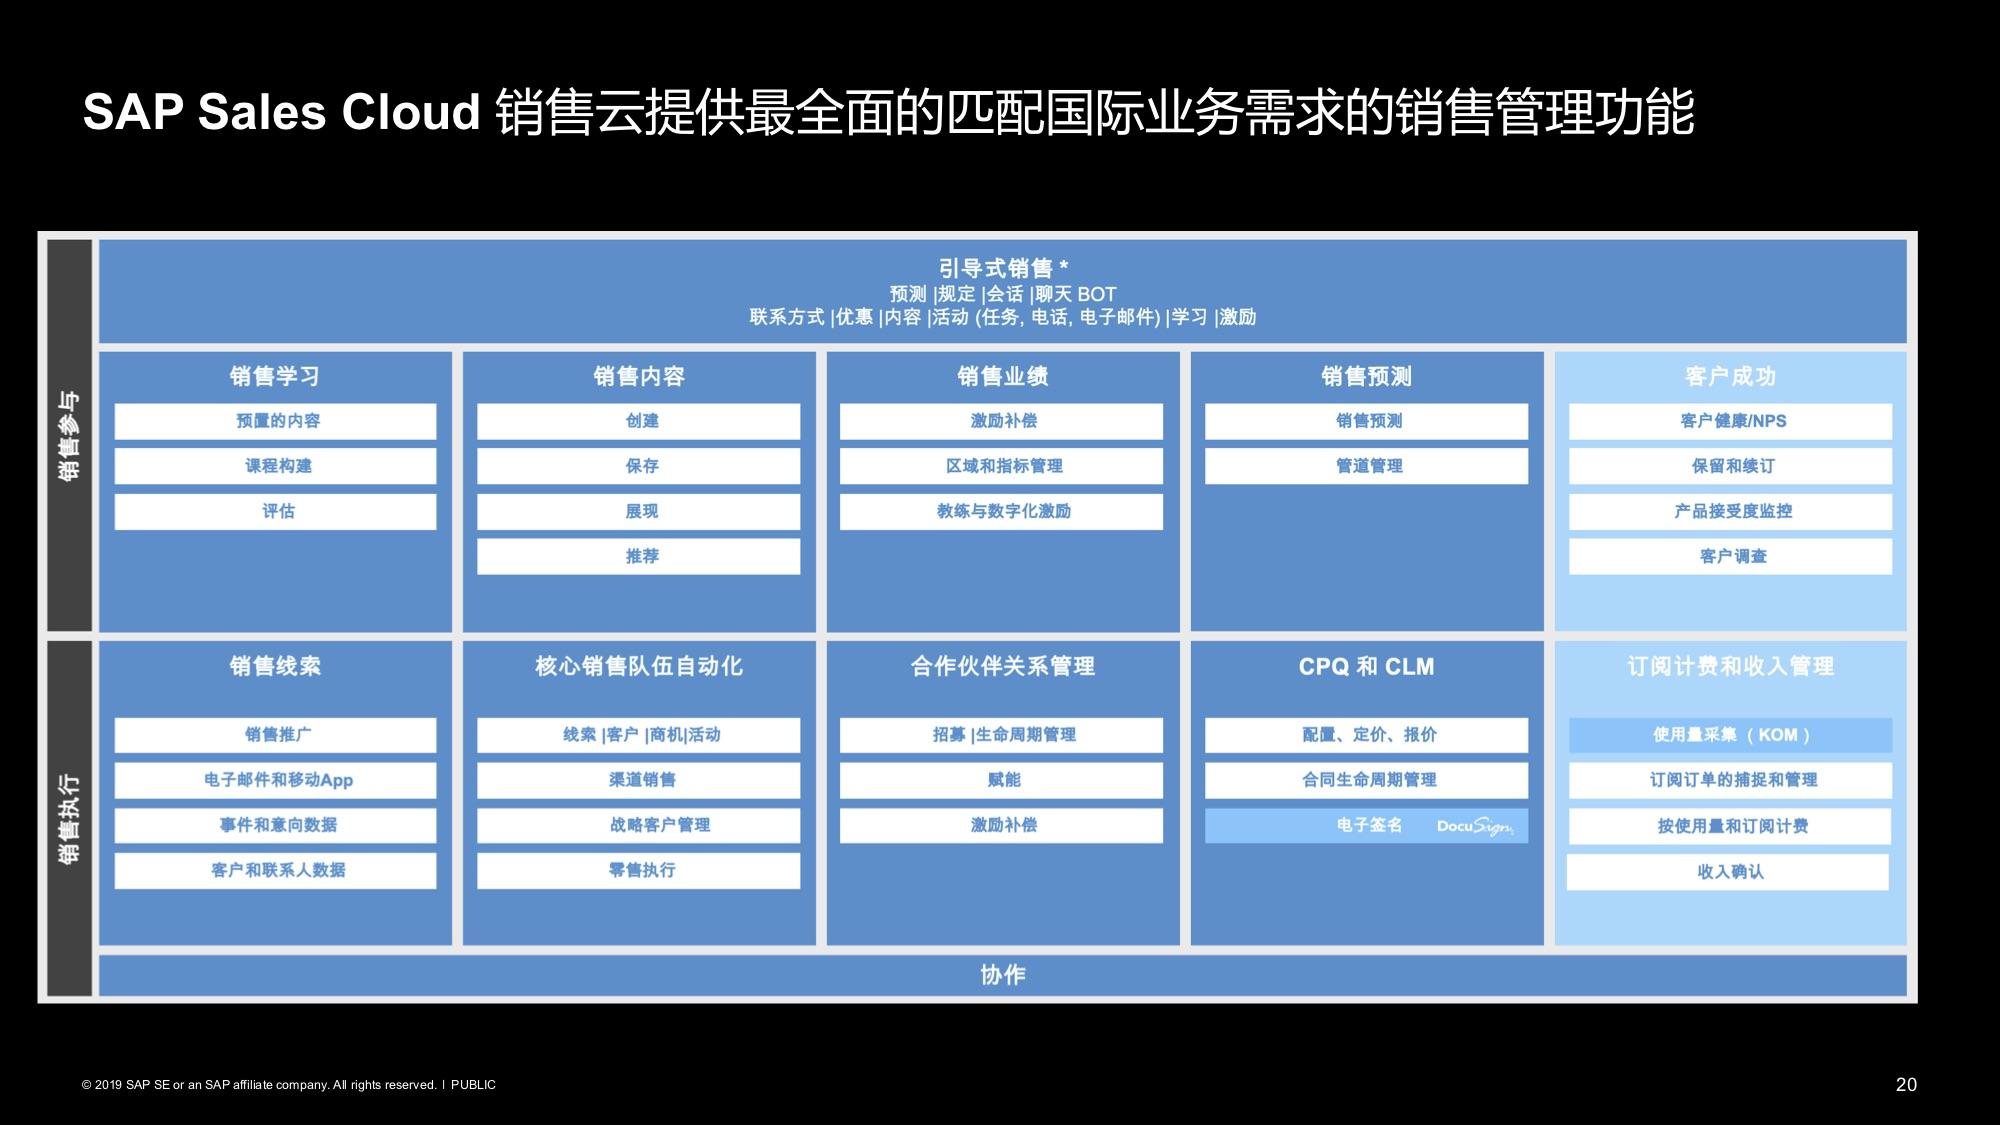 Overseas distribution system 3